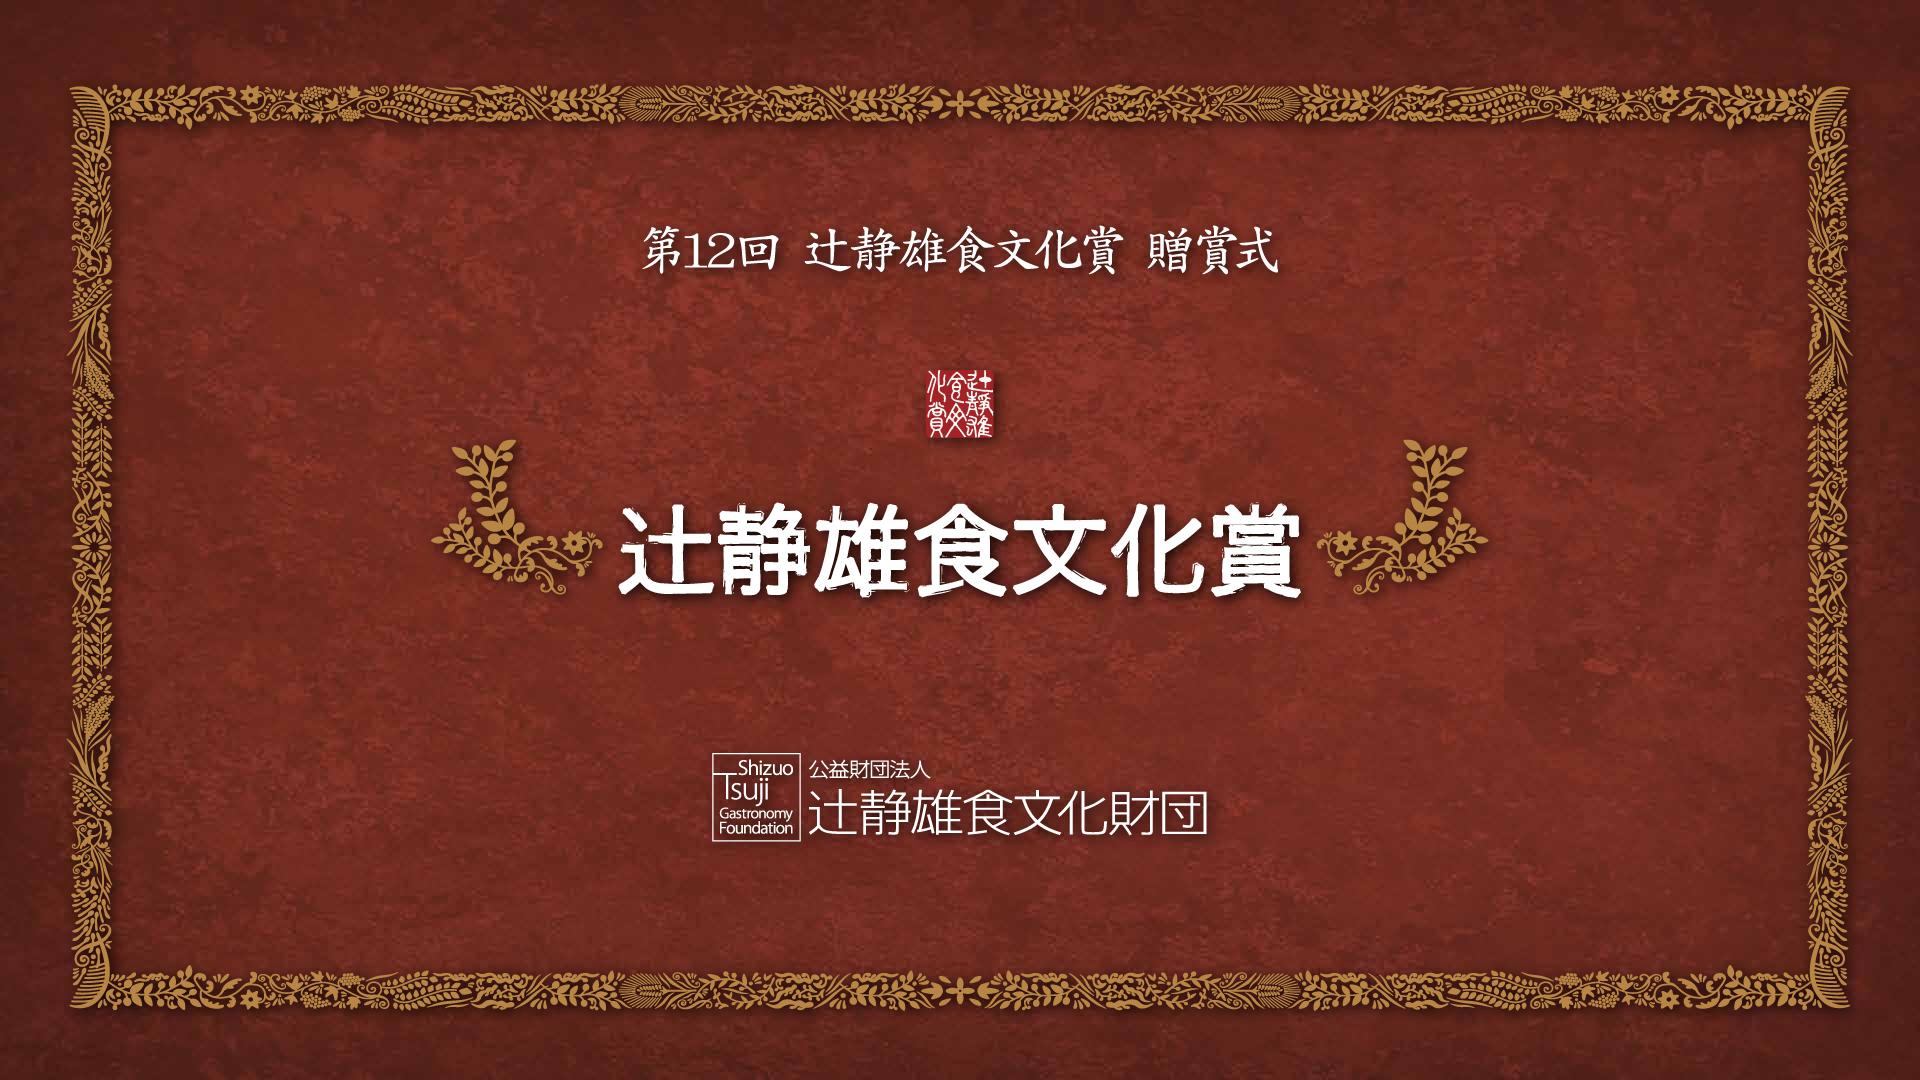 第12回辻静雄食文化賞贈賞式*ダイジェスト動画公開